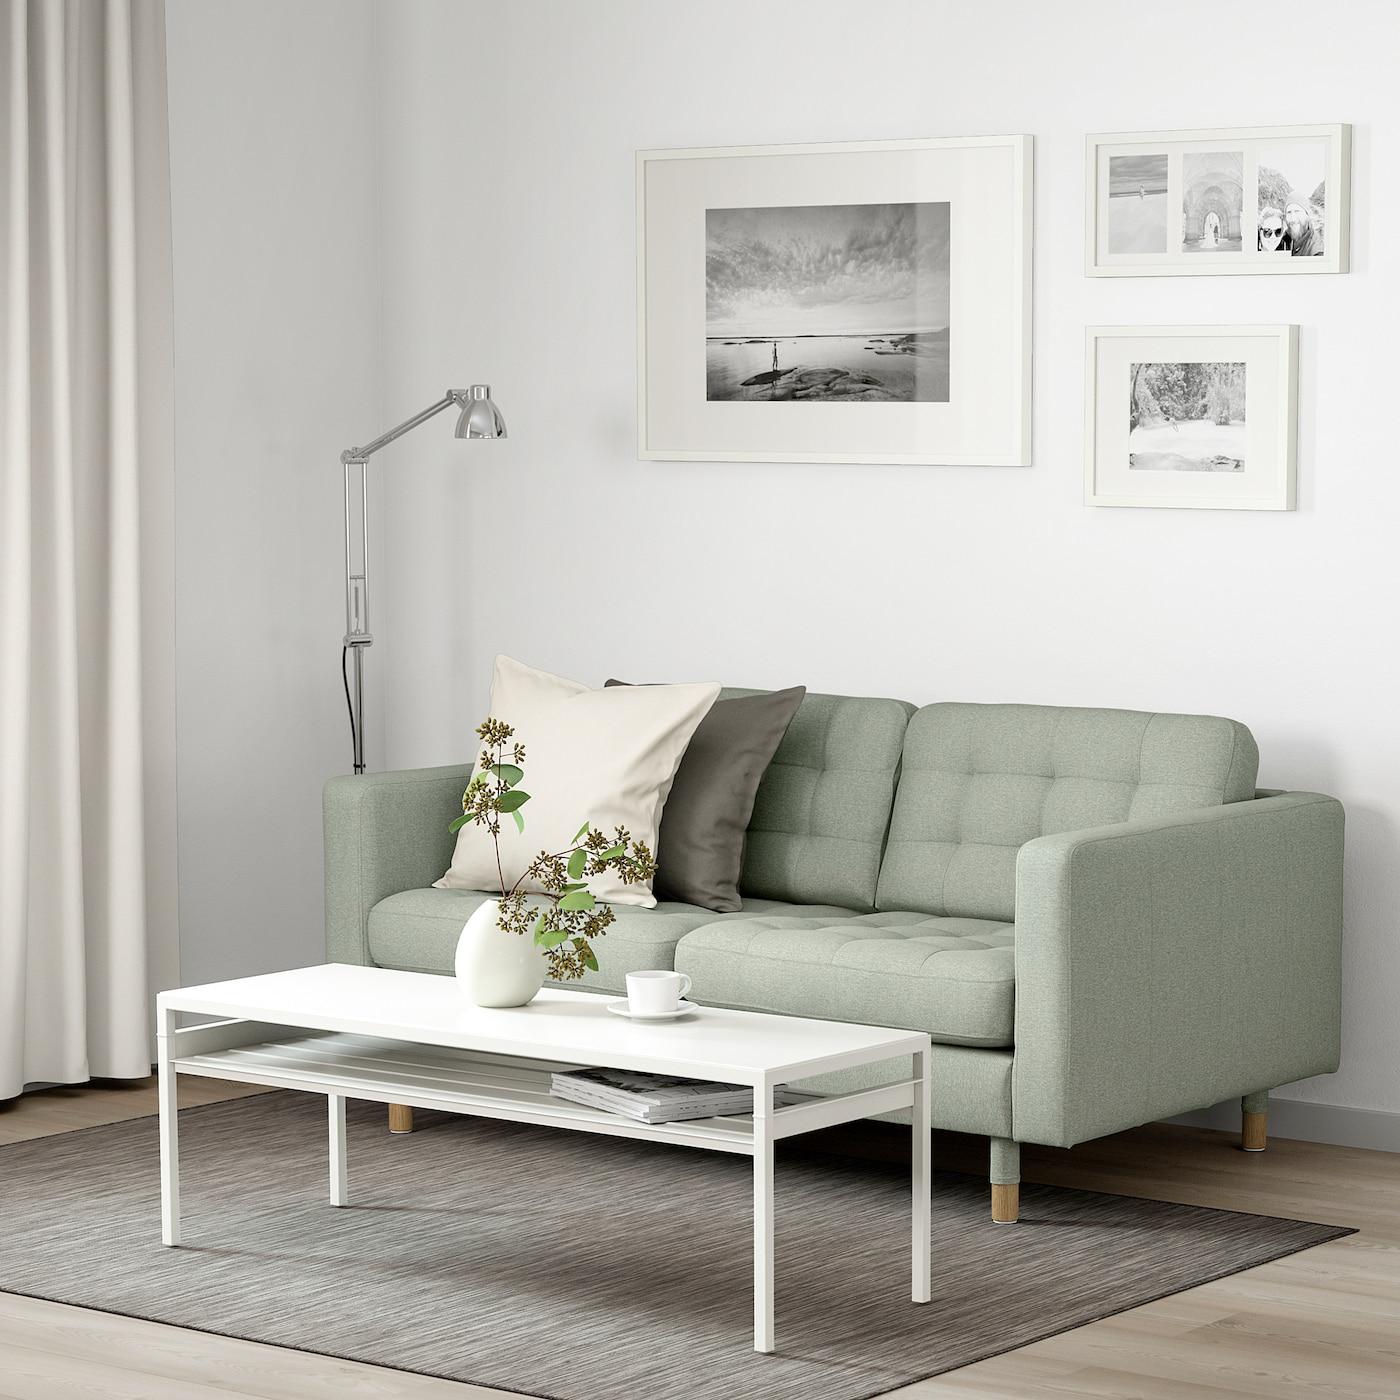 Landskrona 2 Zitsbank Gunnared Lichtgroen Hout Ikea